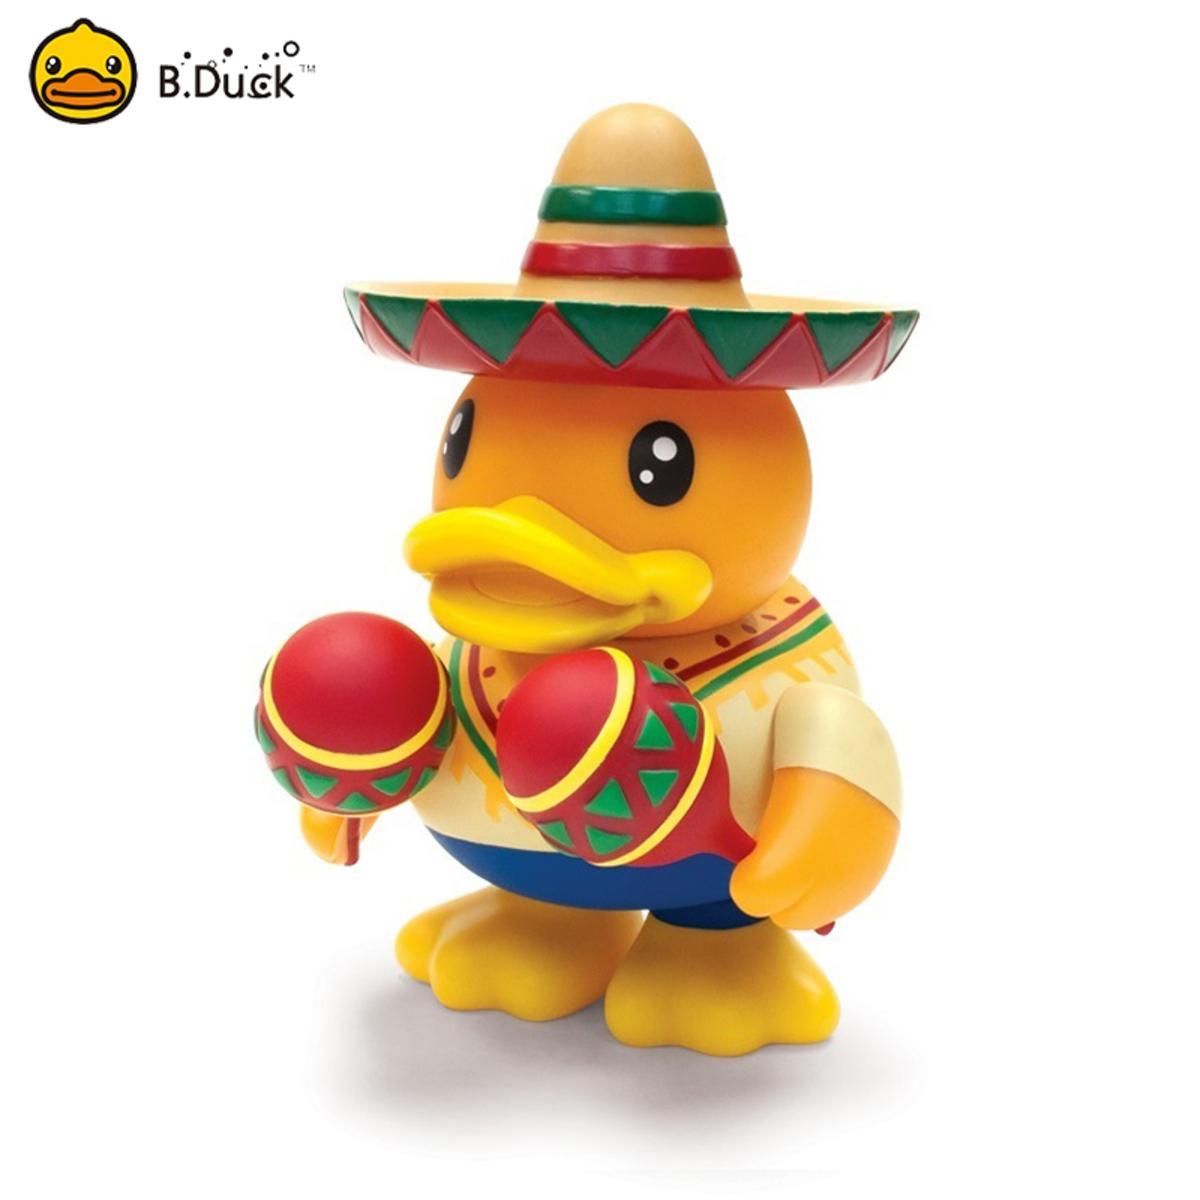 B.Duck 鴨仔錢罌 16cm(環遊世界系列 墨西哥)Saving Bank